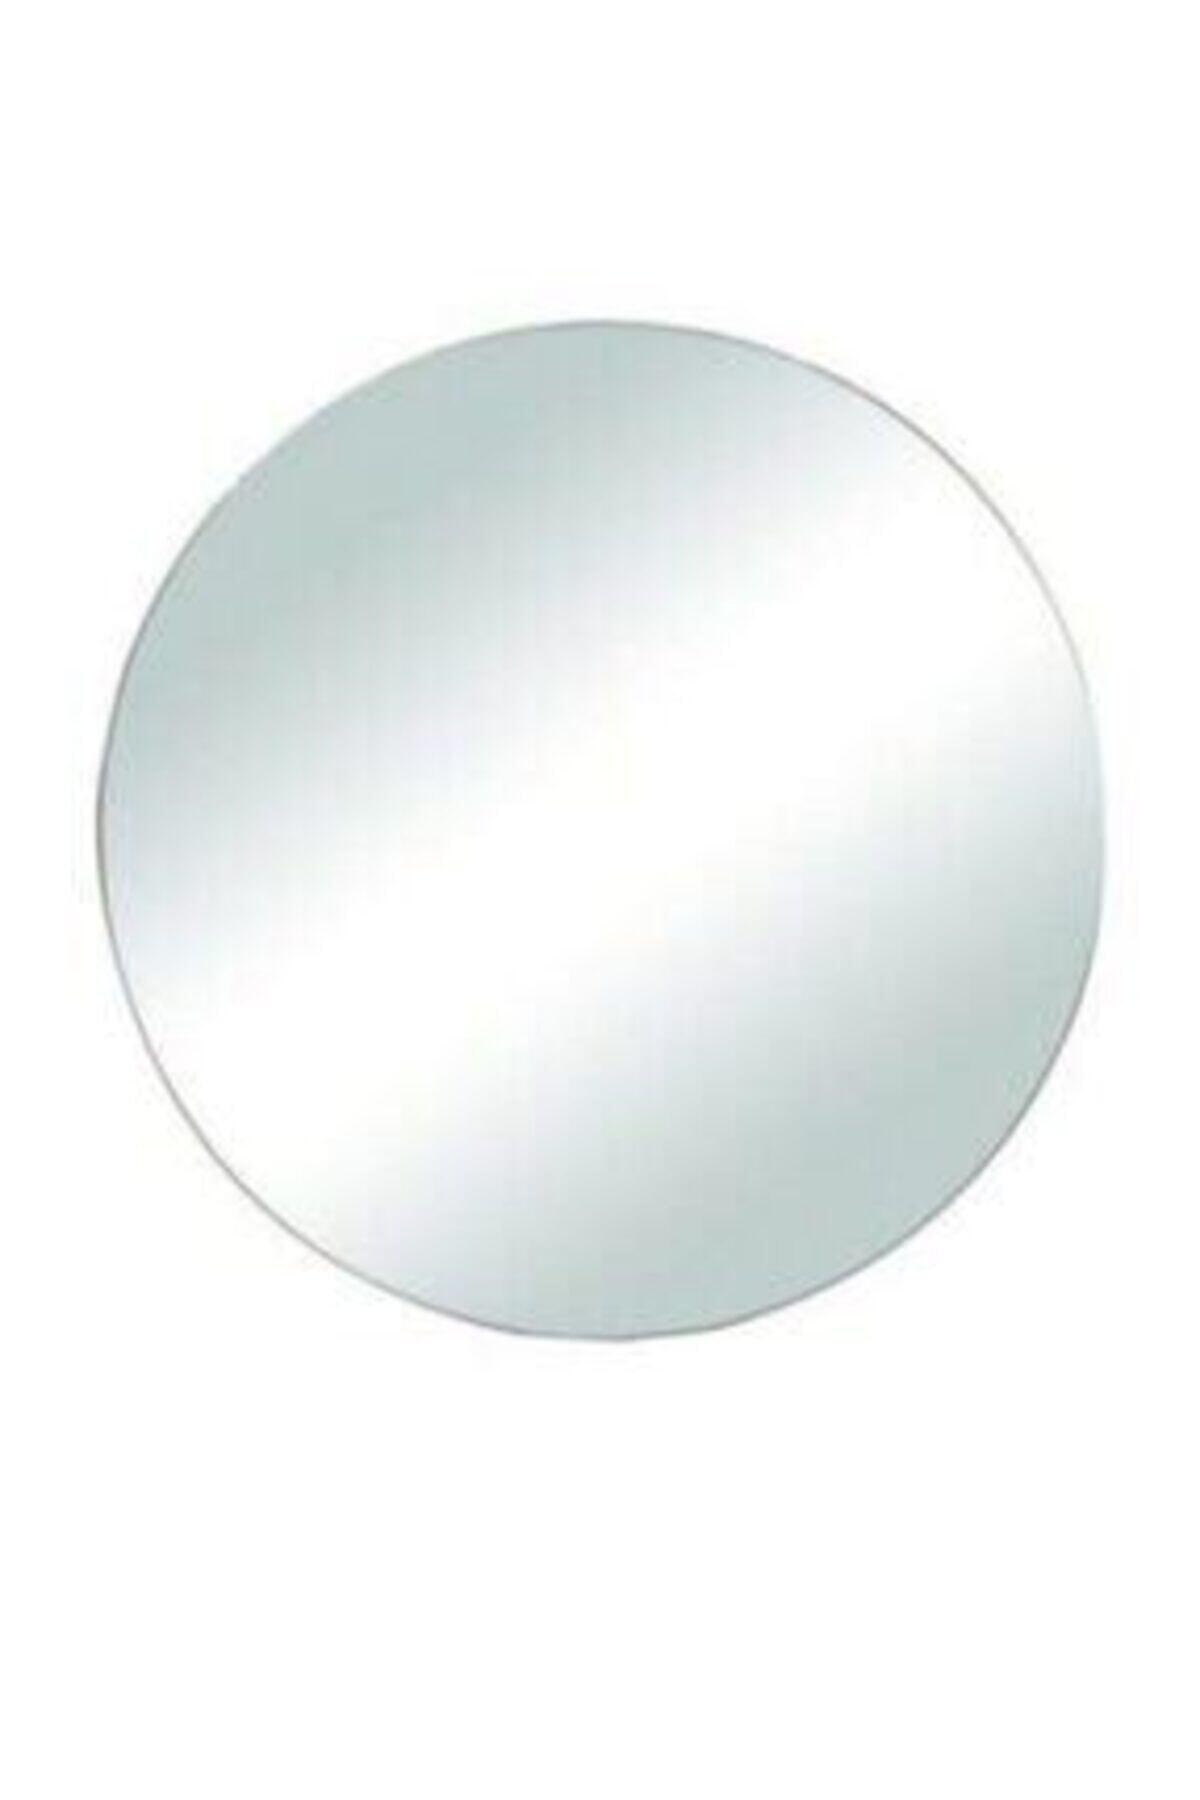 AKAN GRUP Yuvarlak Ayna 15 Cm 1